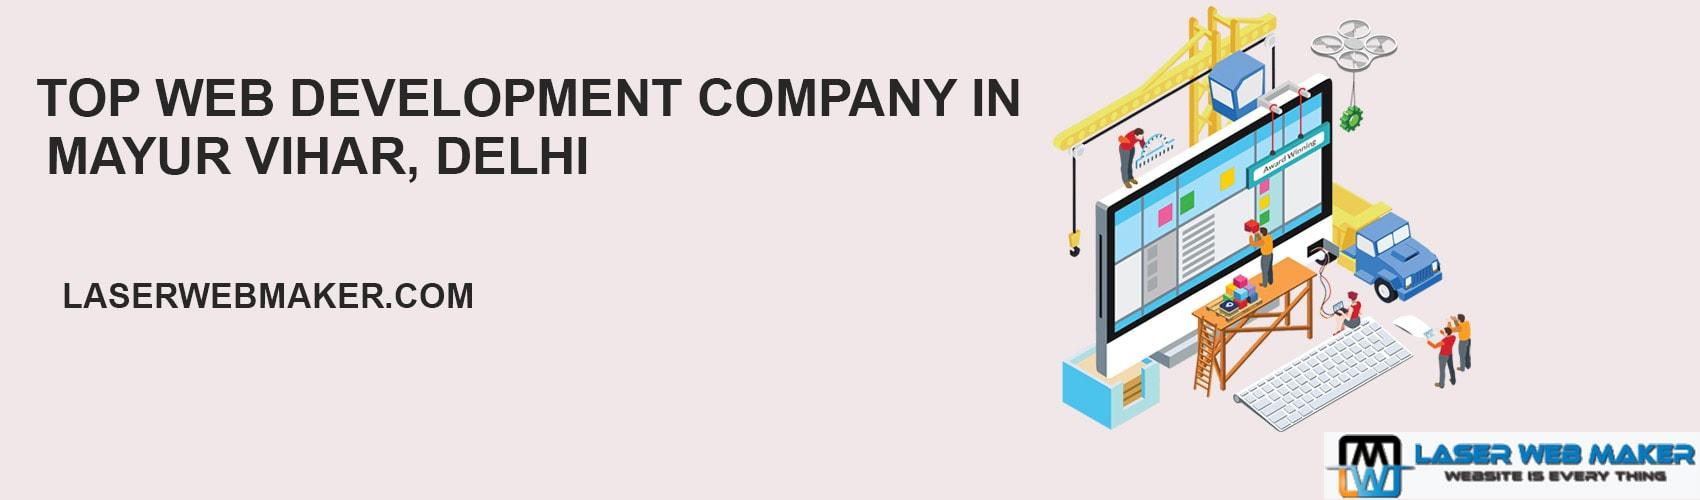 Top Web Development Company In Mayur Vihar, Delhi